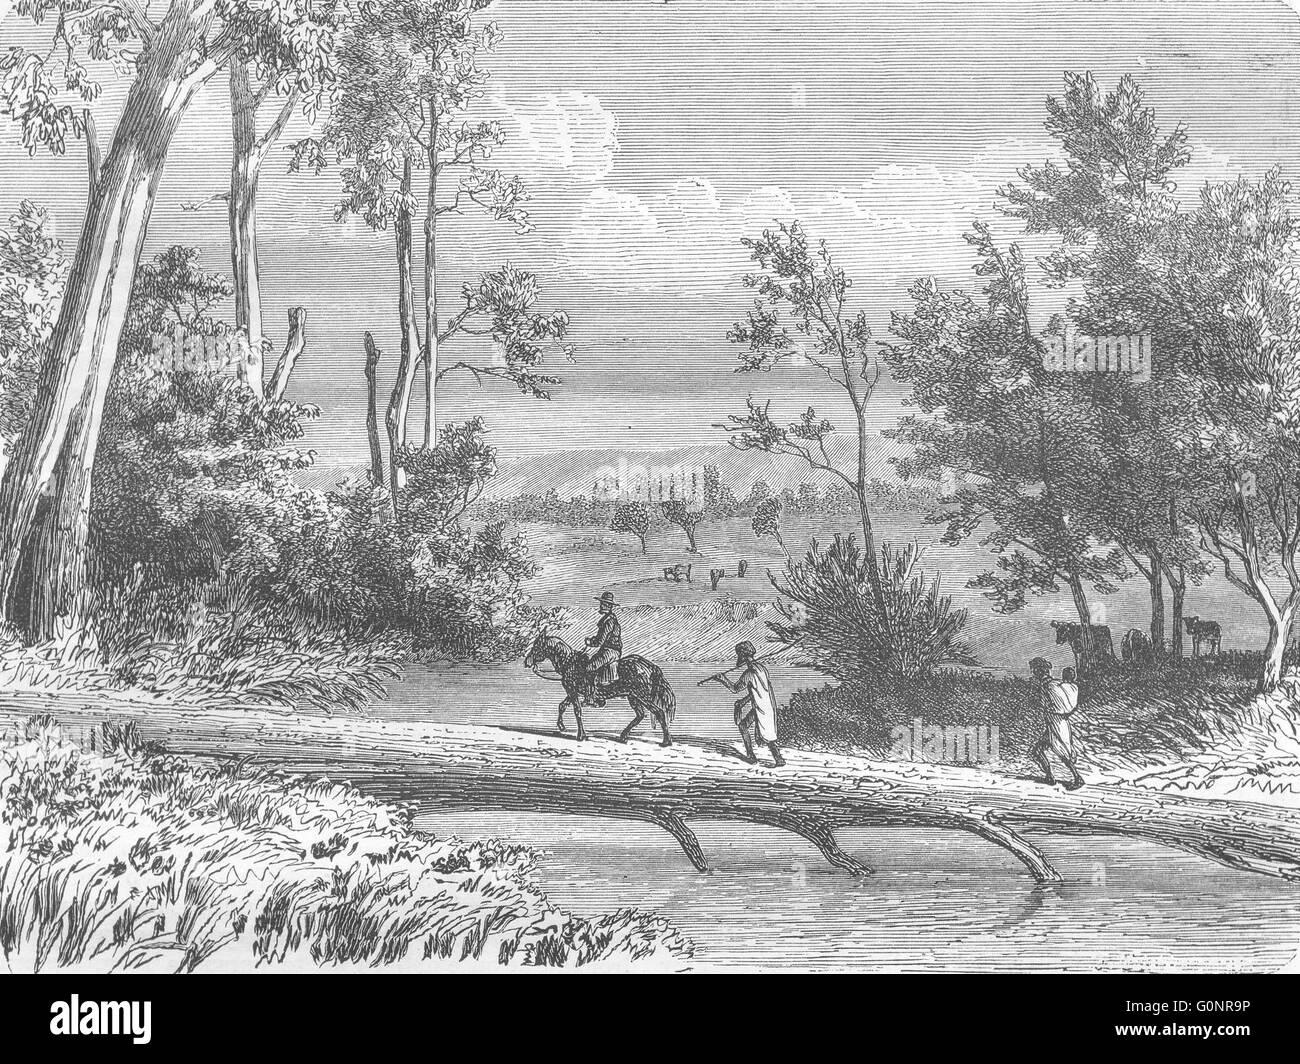 AUSTRALIA: Trunk of an Eucalyptus, antique print 1870 - Stock Image